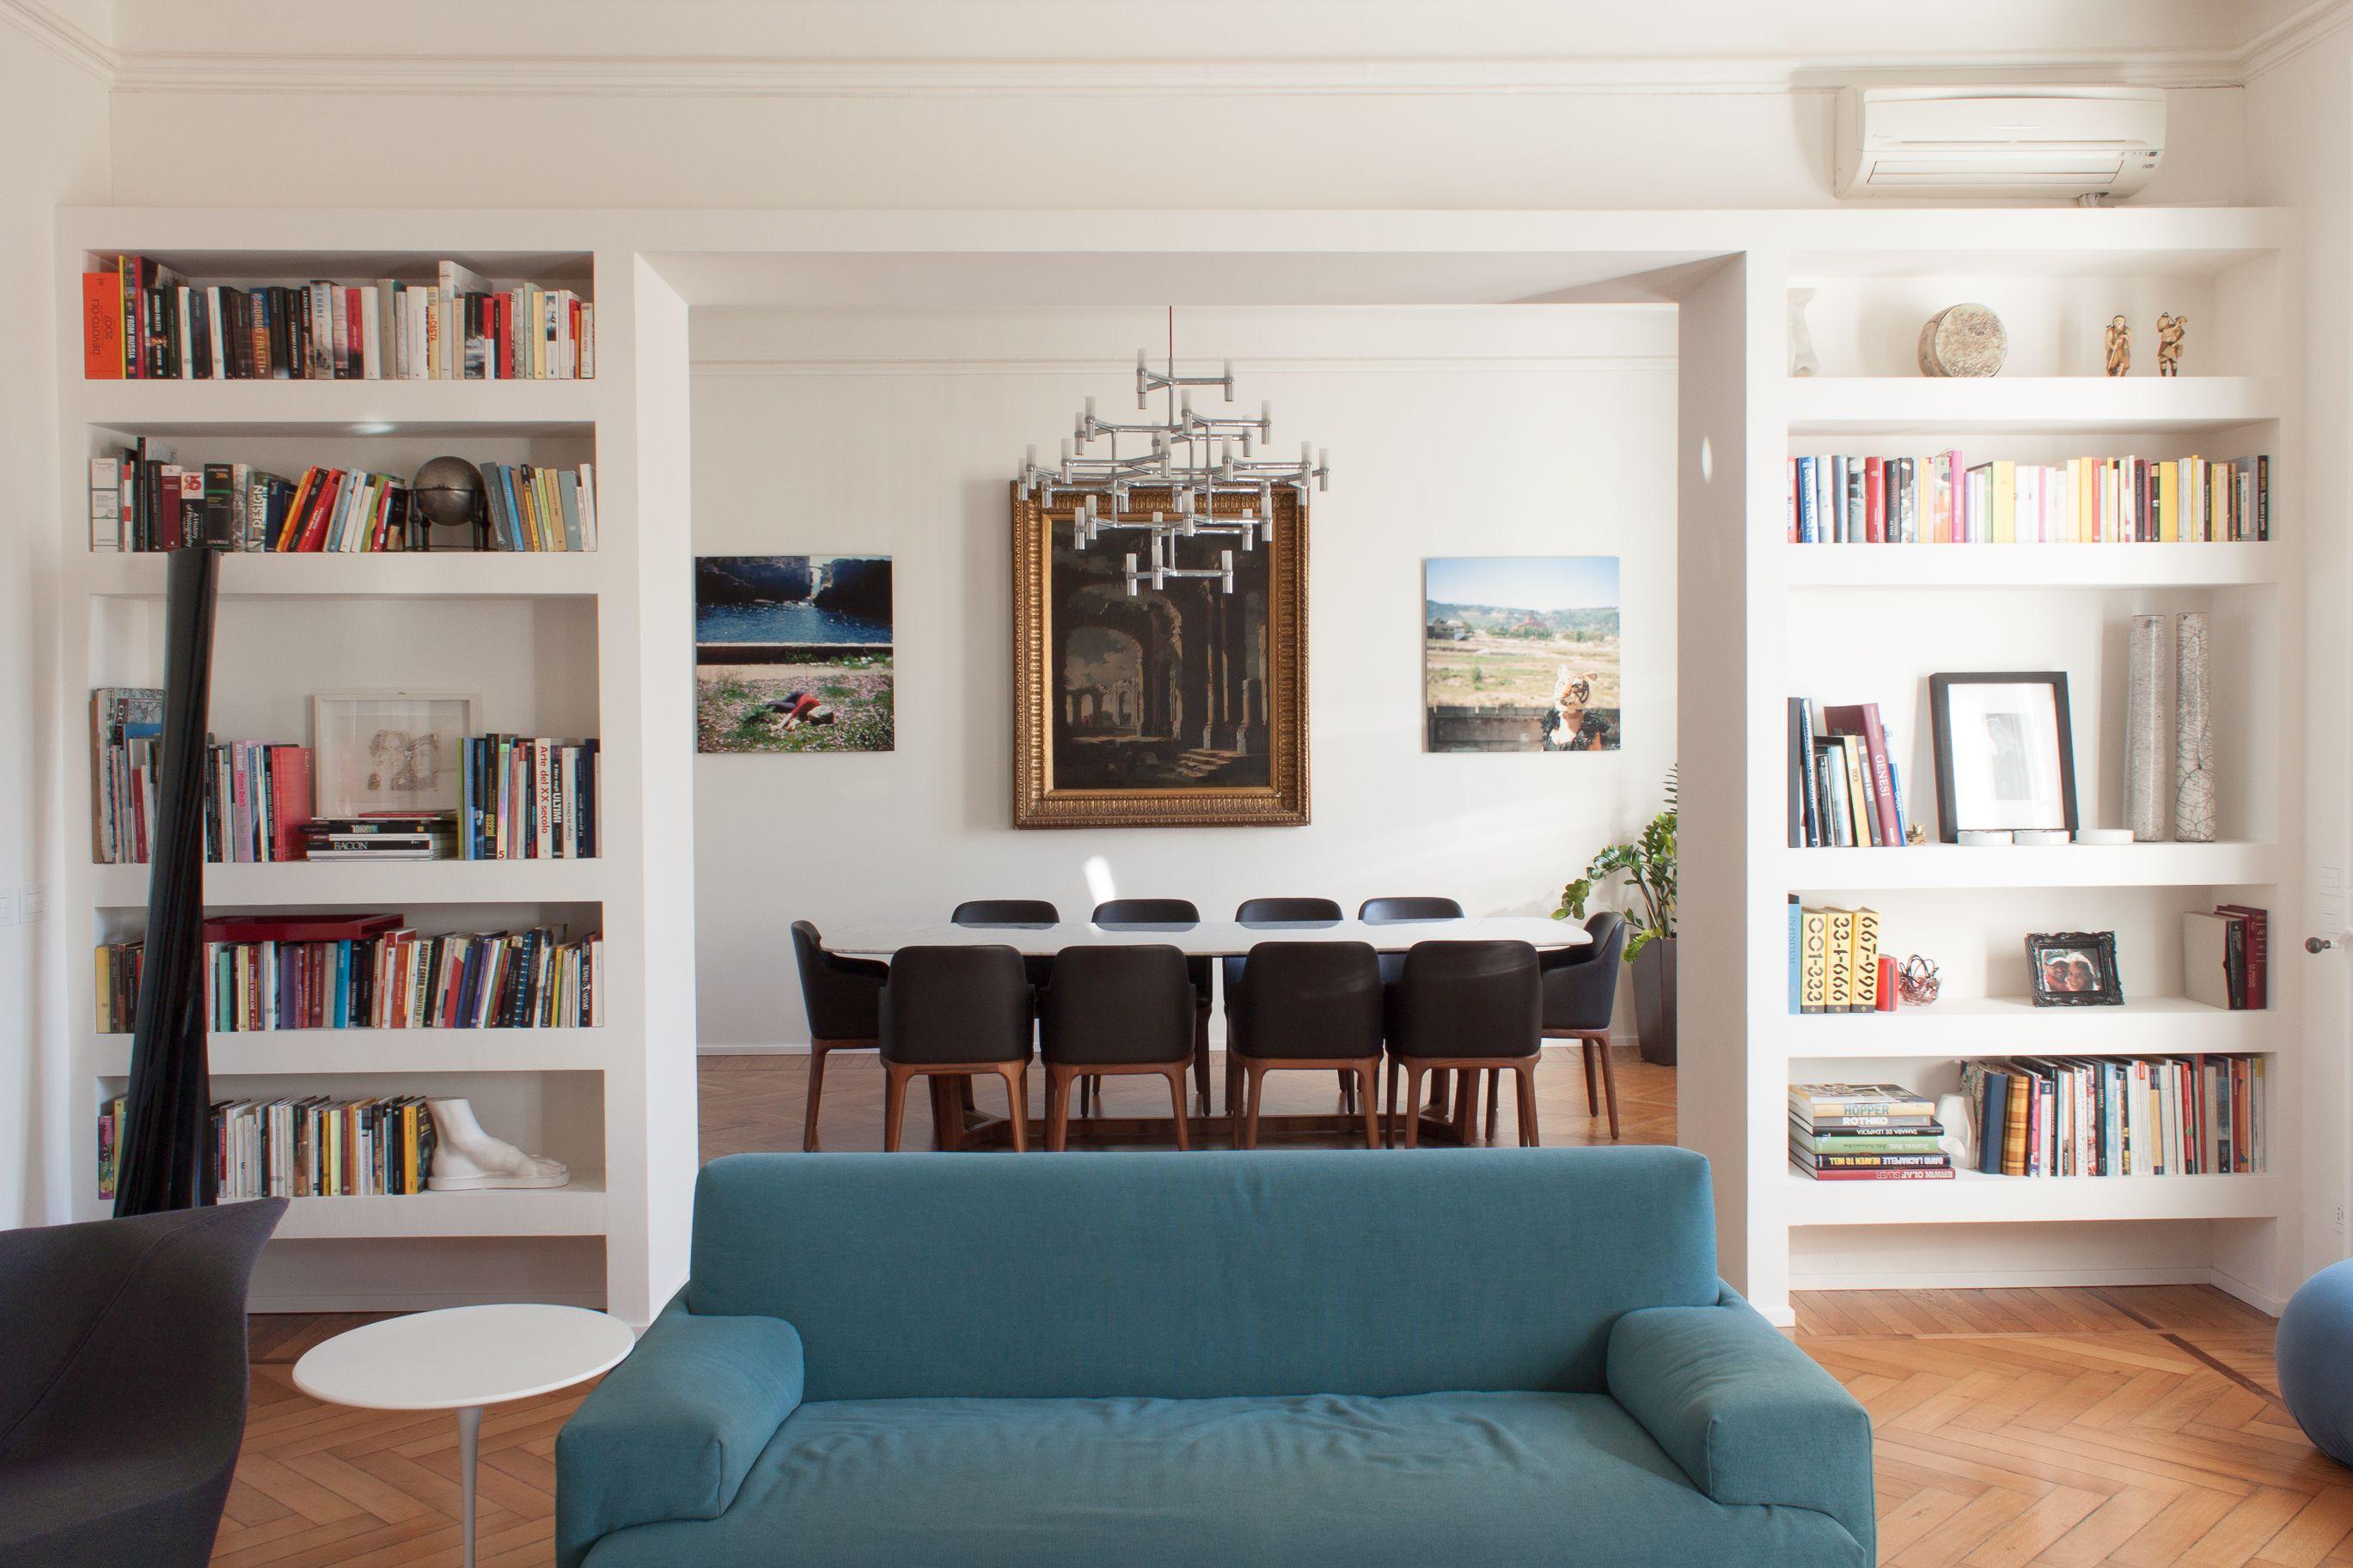 Arredamento Moderno Casa.Arredo Moderno Per La Casa D Epoca T5 Design 3a Studio